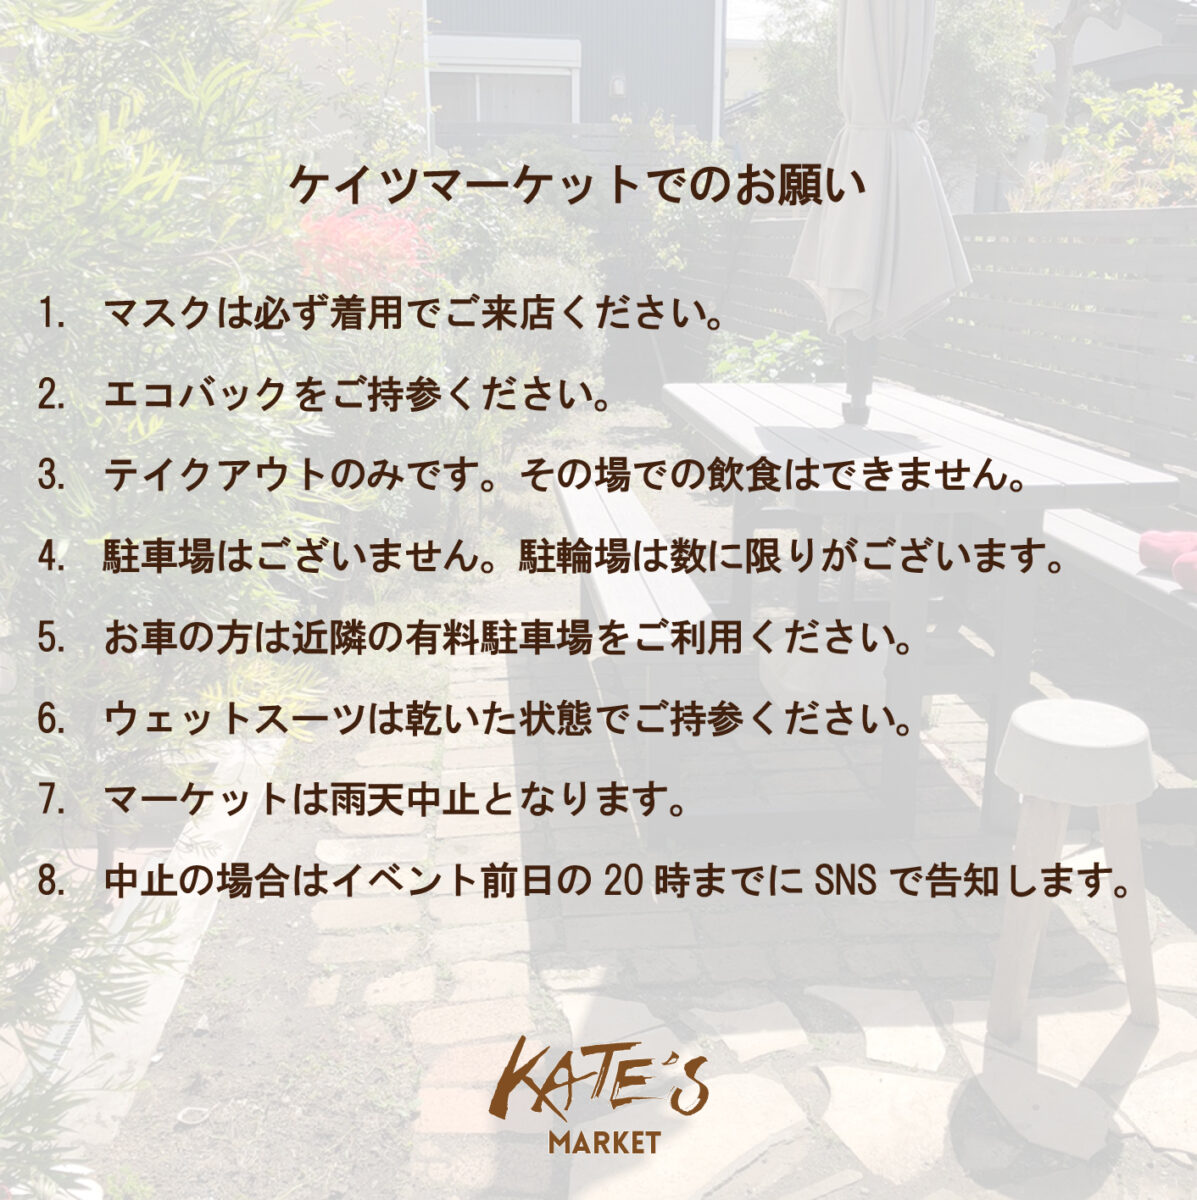 「第1回KATE'S MARKET」開催!